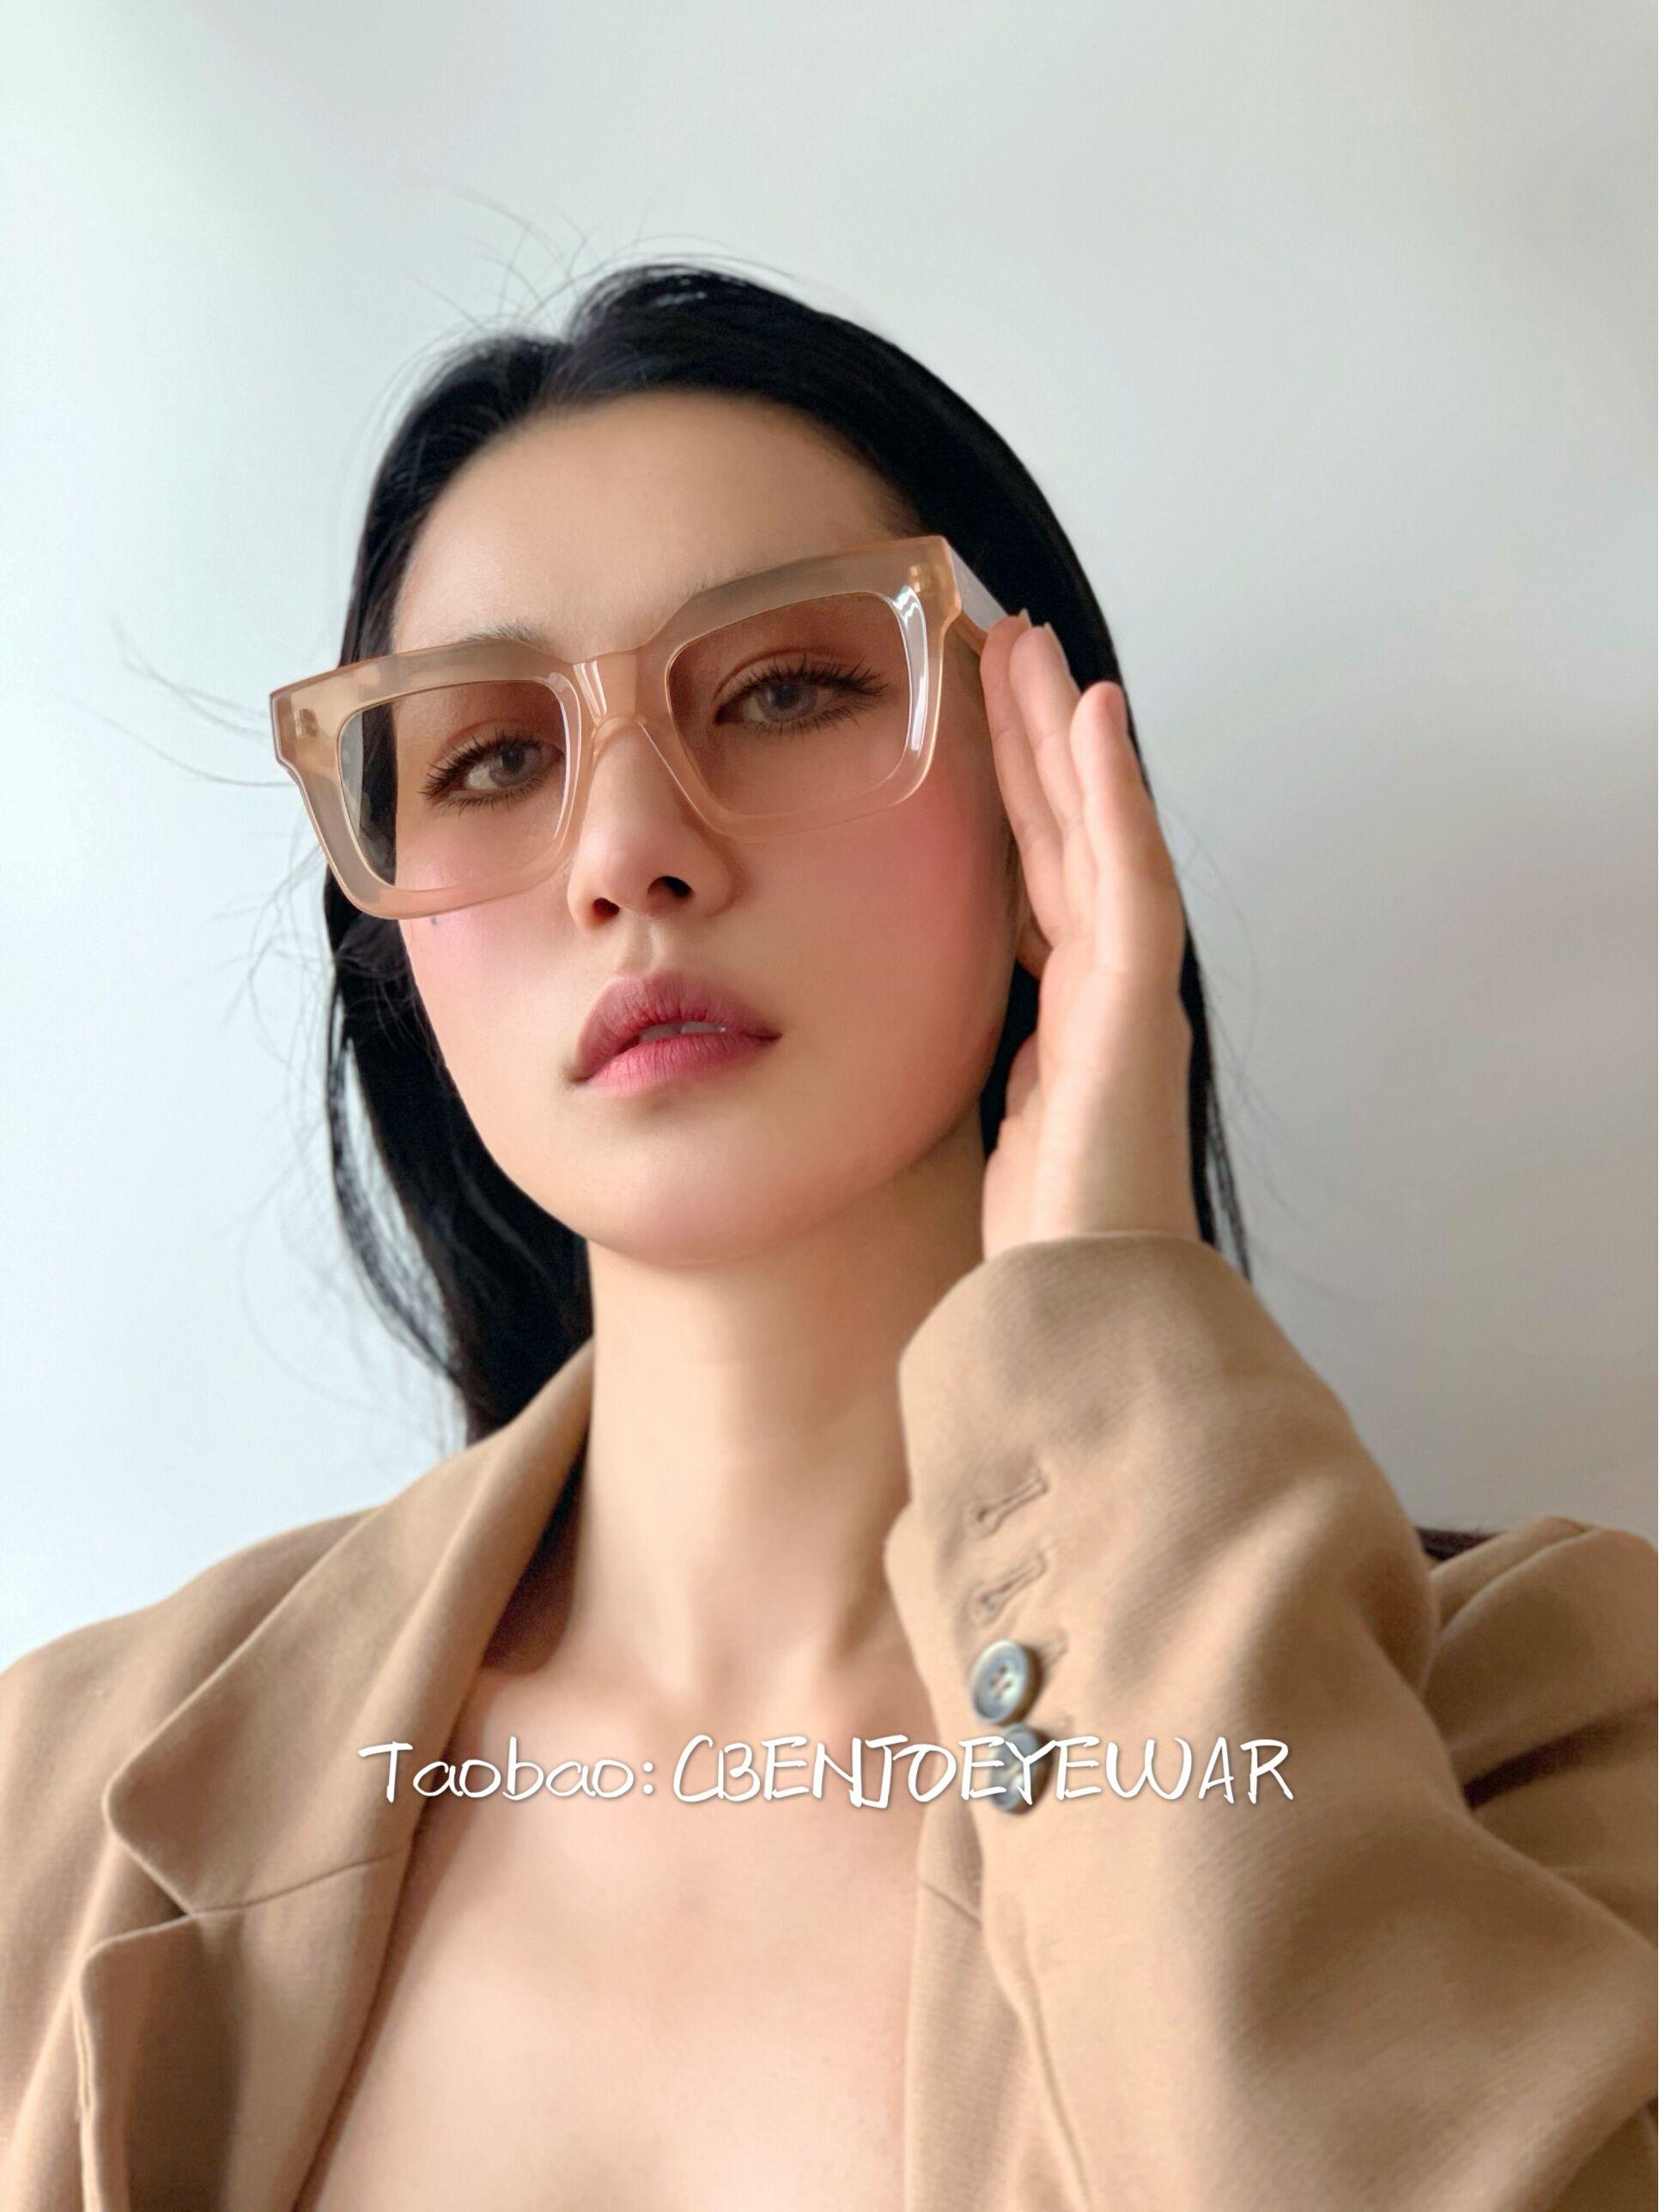 CBENJO【温柔裸粉】低饱和色调温润质感墨镜 圆脸方形女